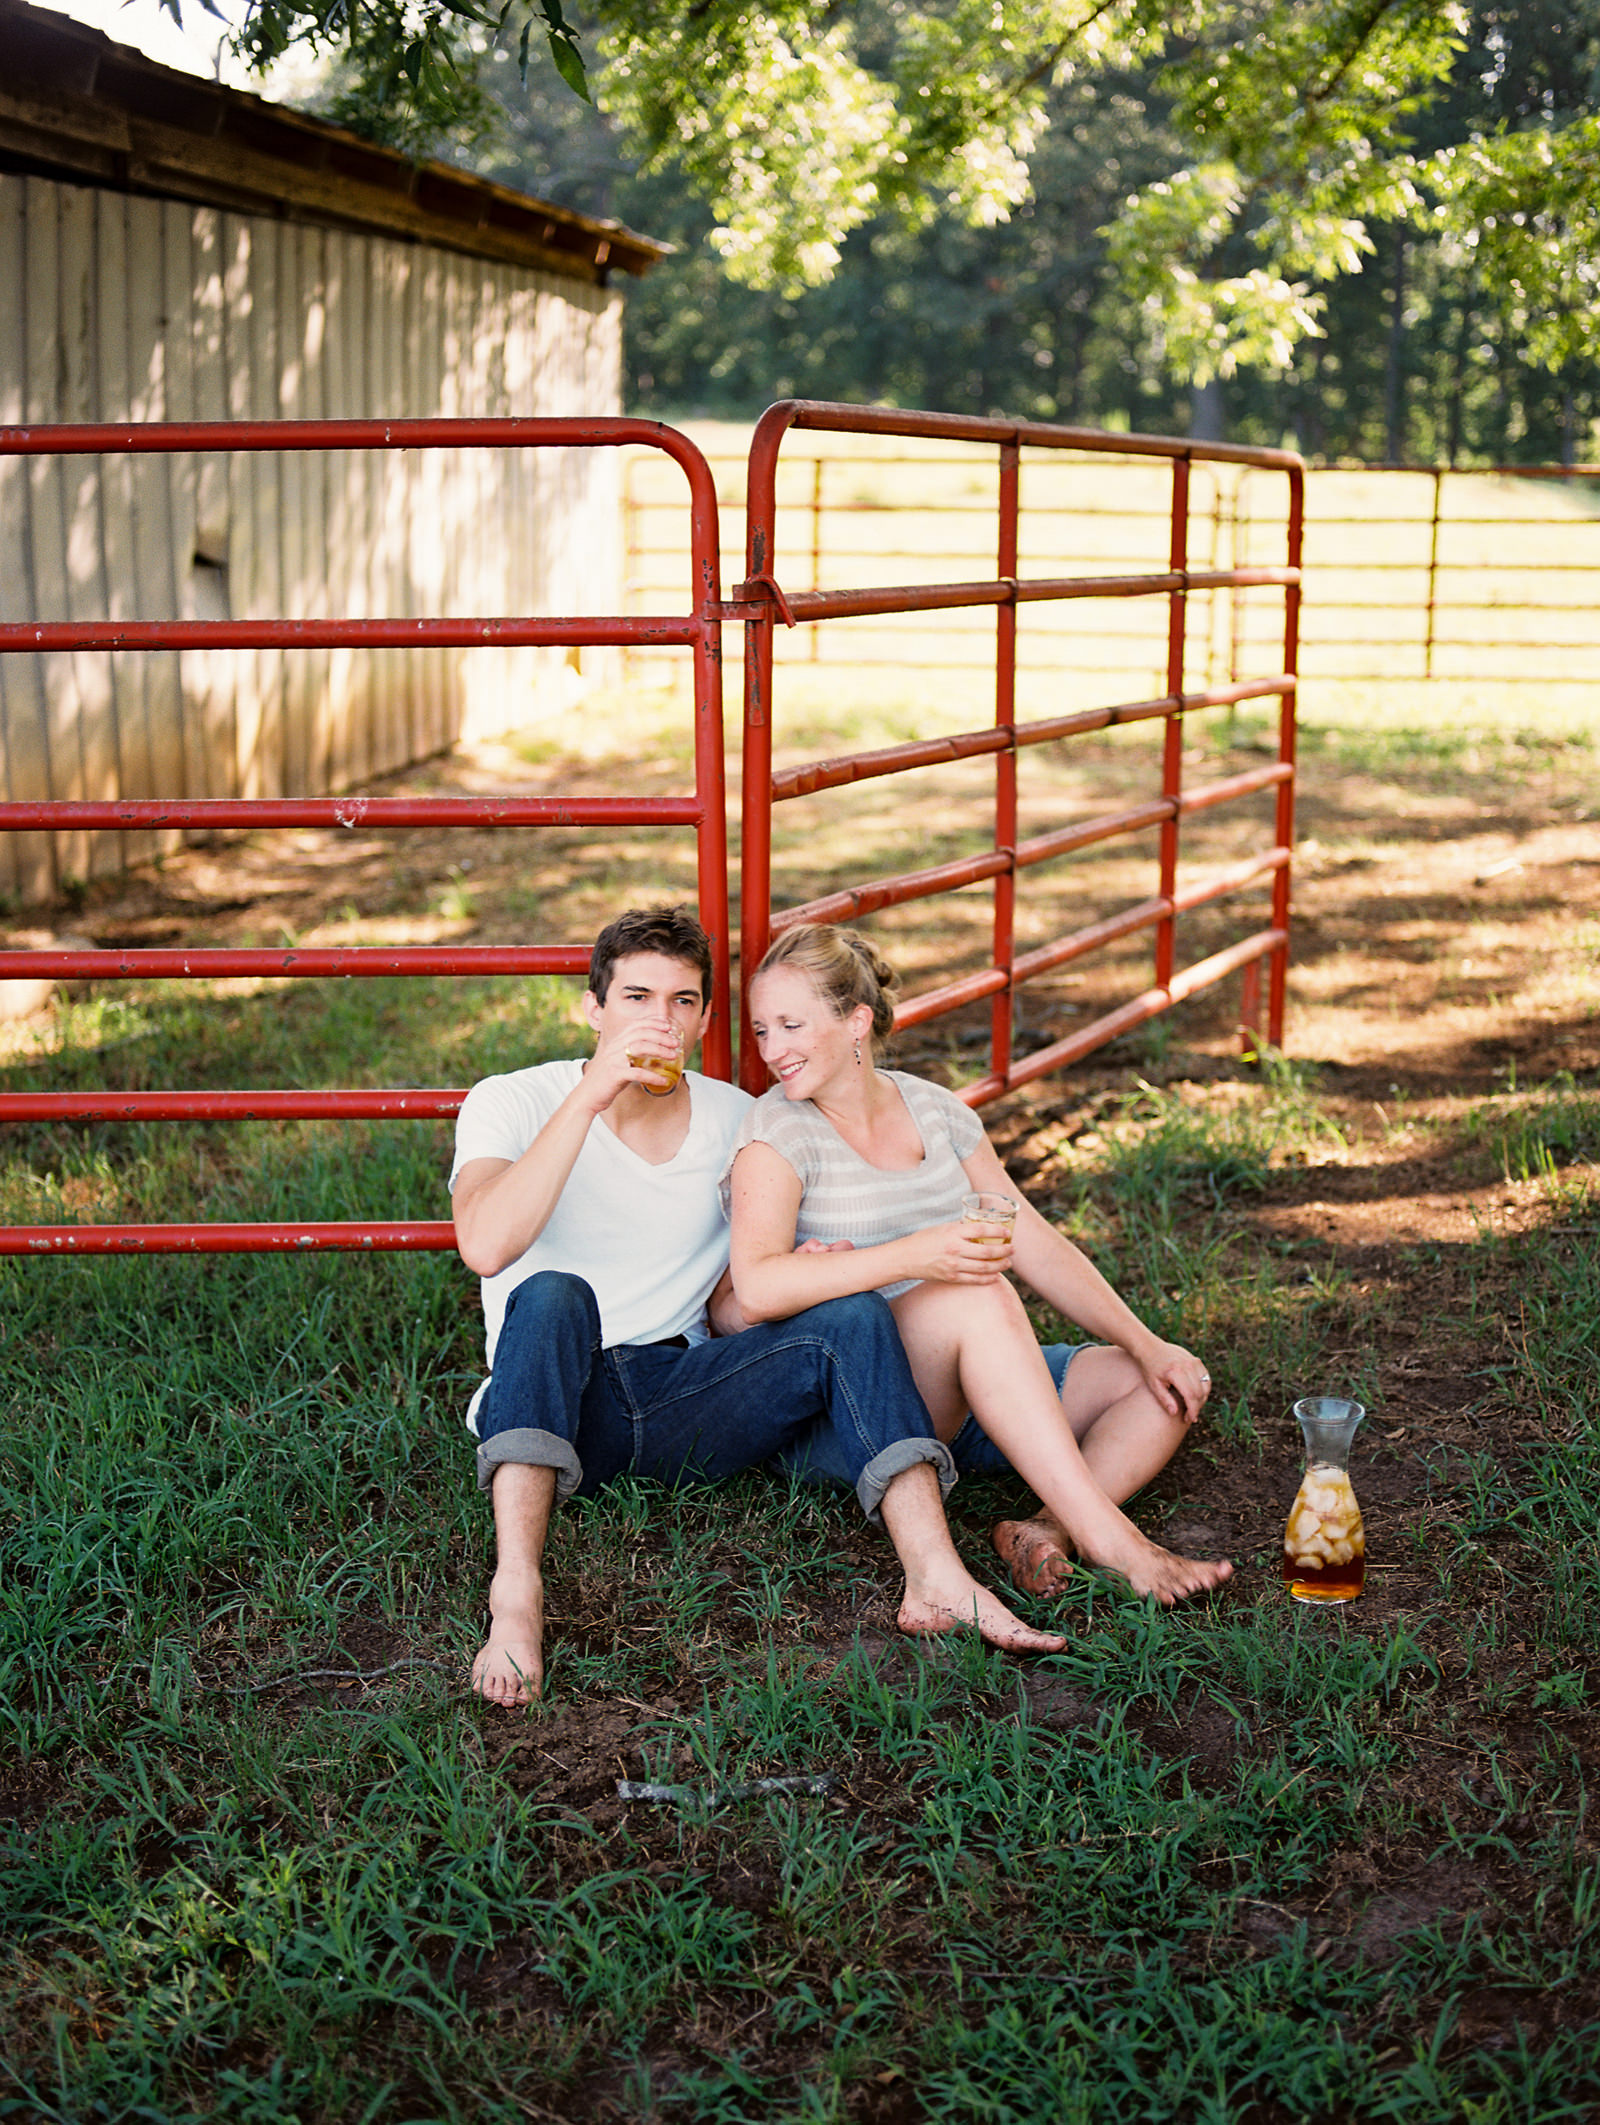 020-maternity-fine-art-film-lifestyle-photography.jpg